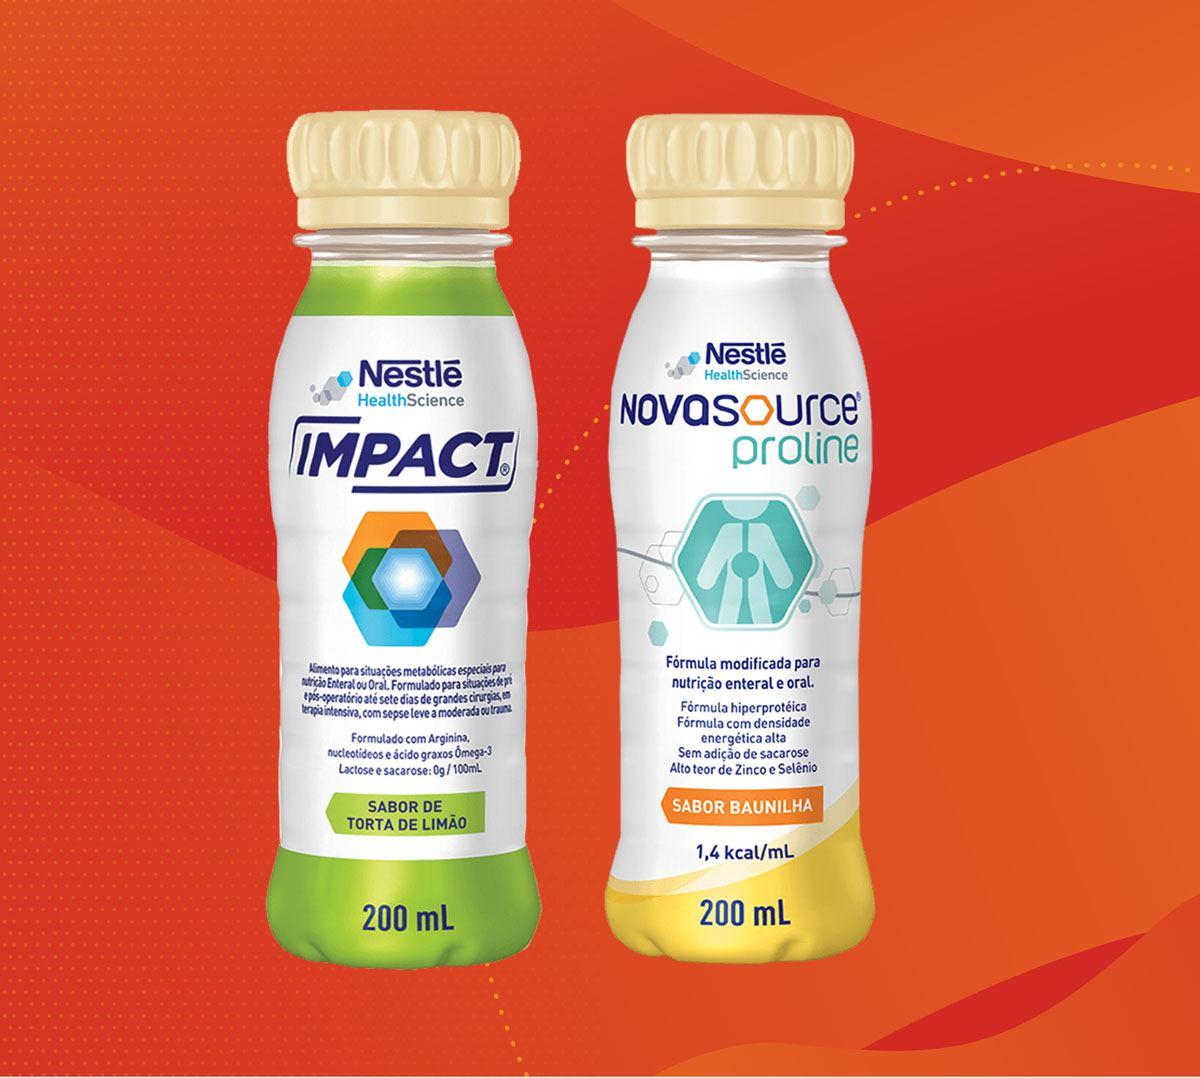 Impact x Novasource Proline: qual a diferença?